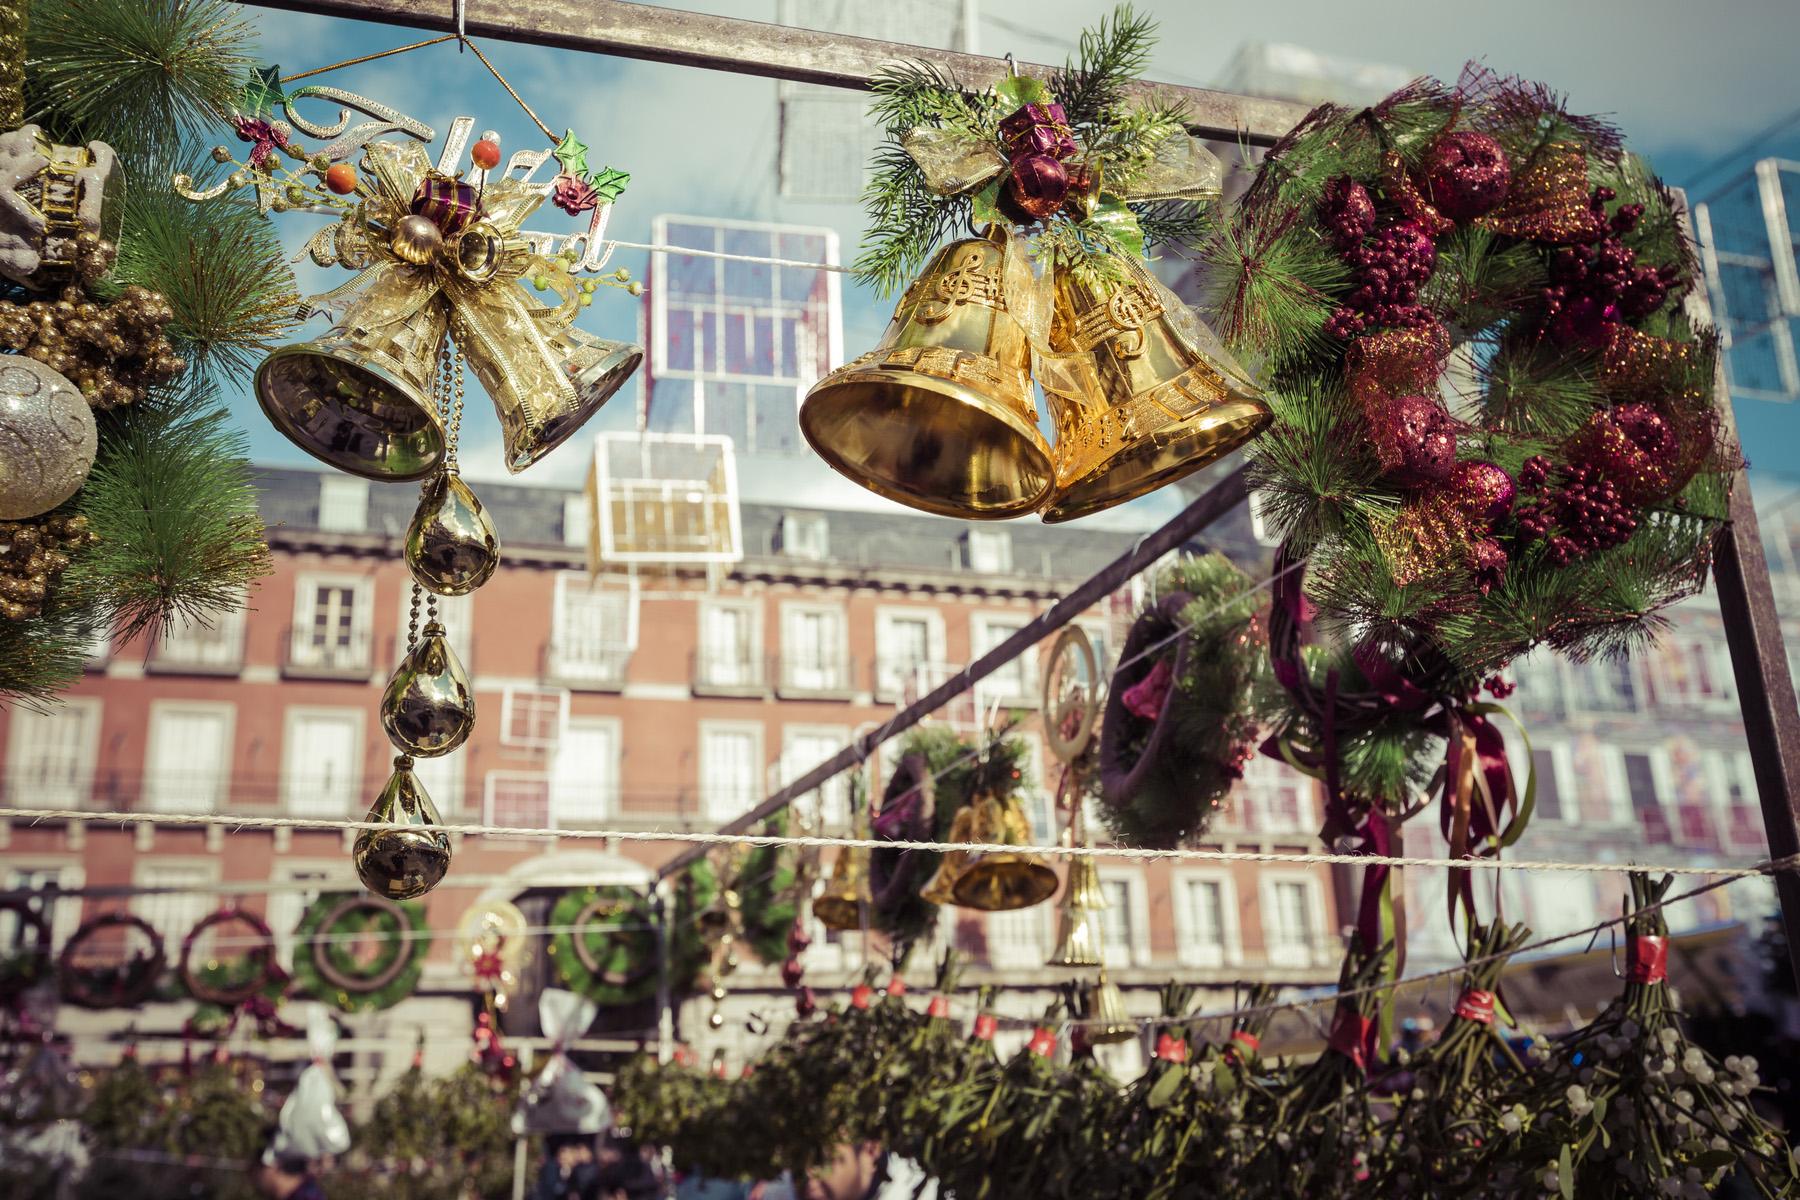 Madrid Christmas market